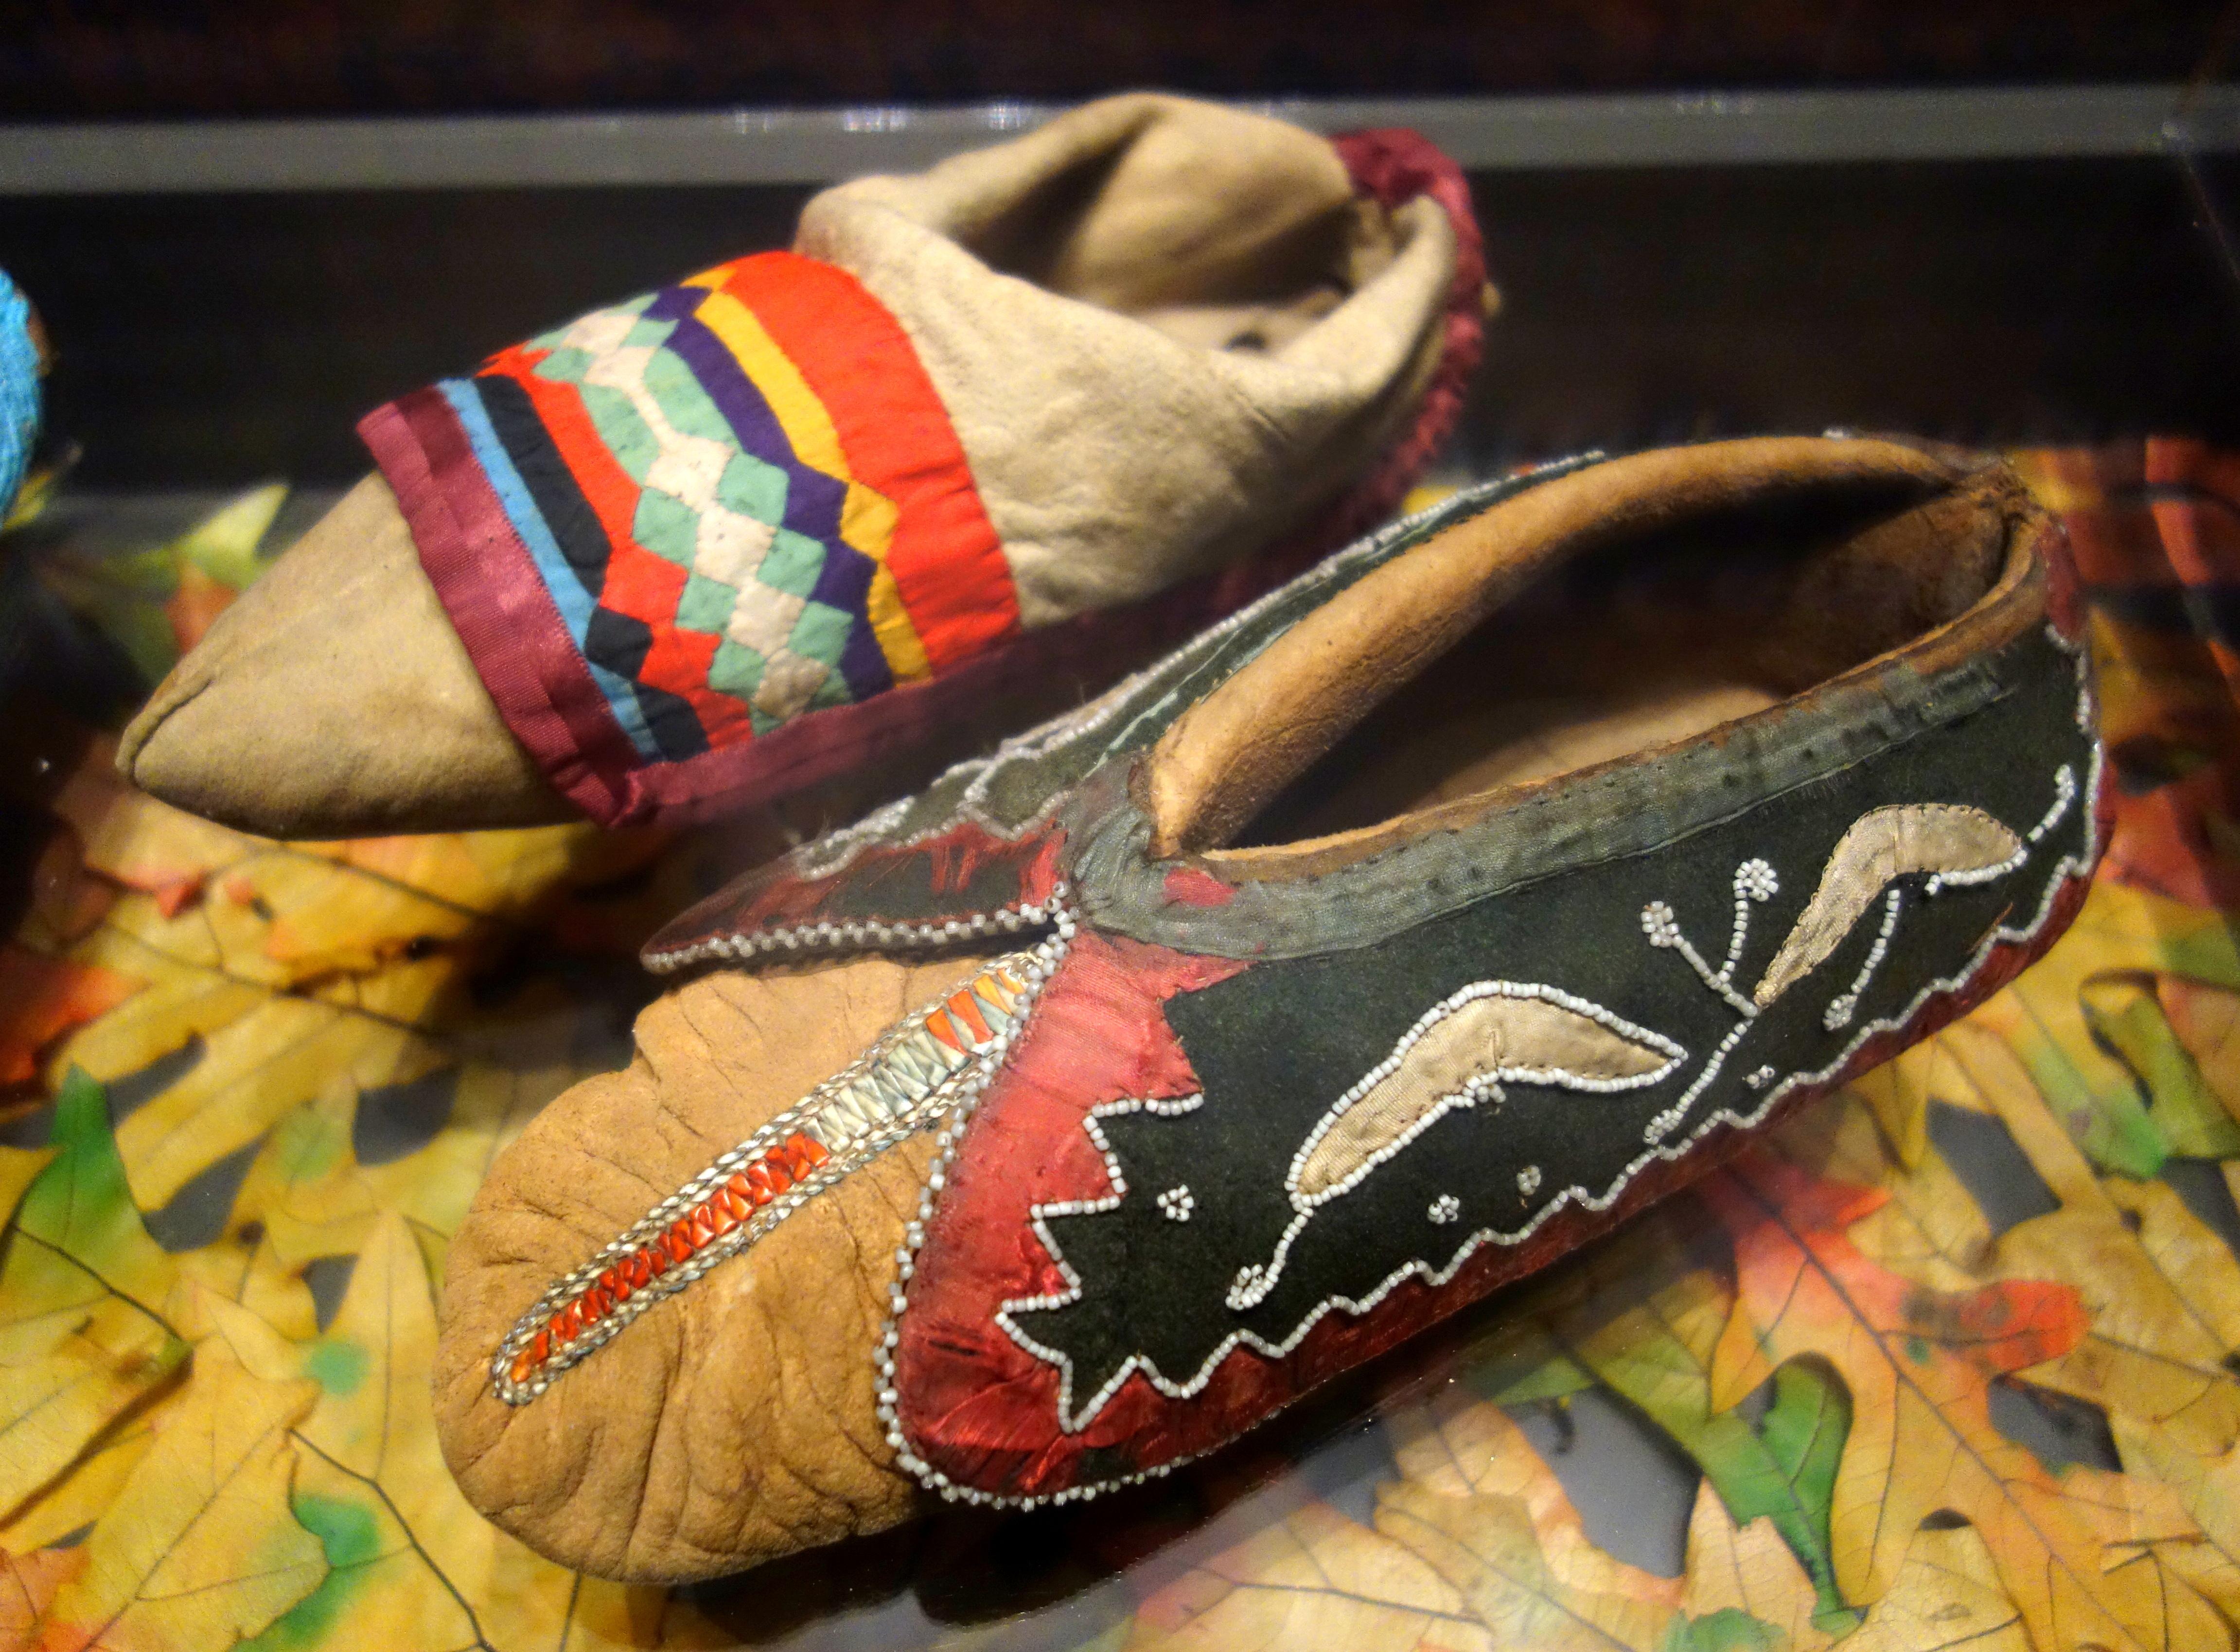 Mohawk Commons Shoe Store